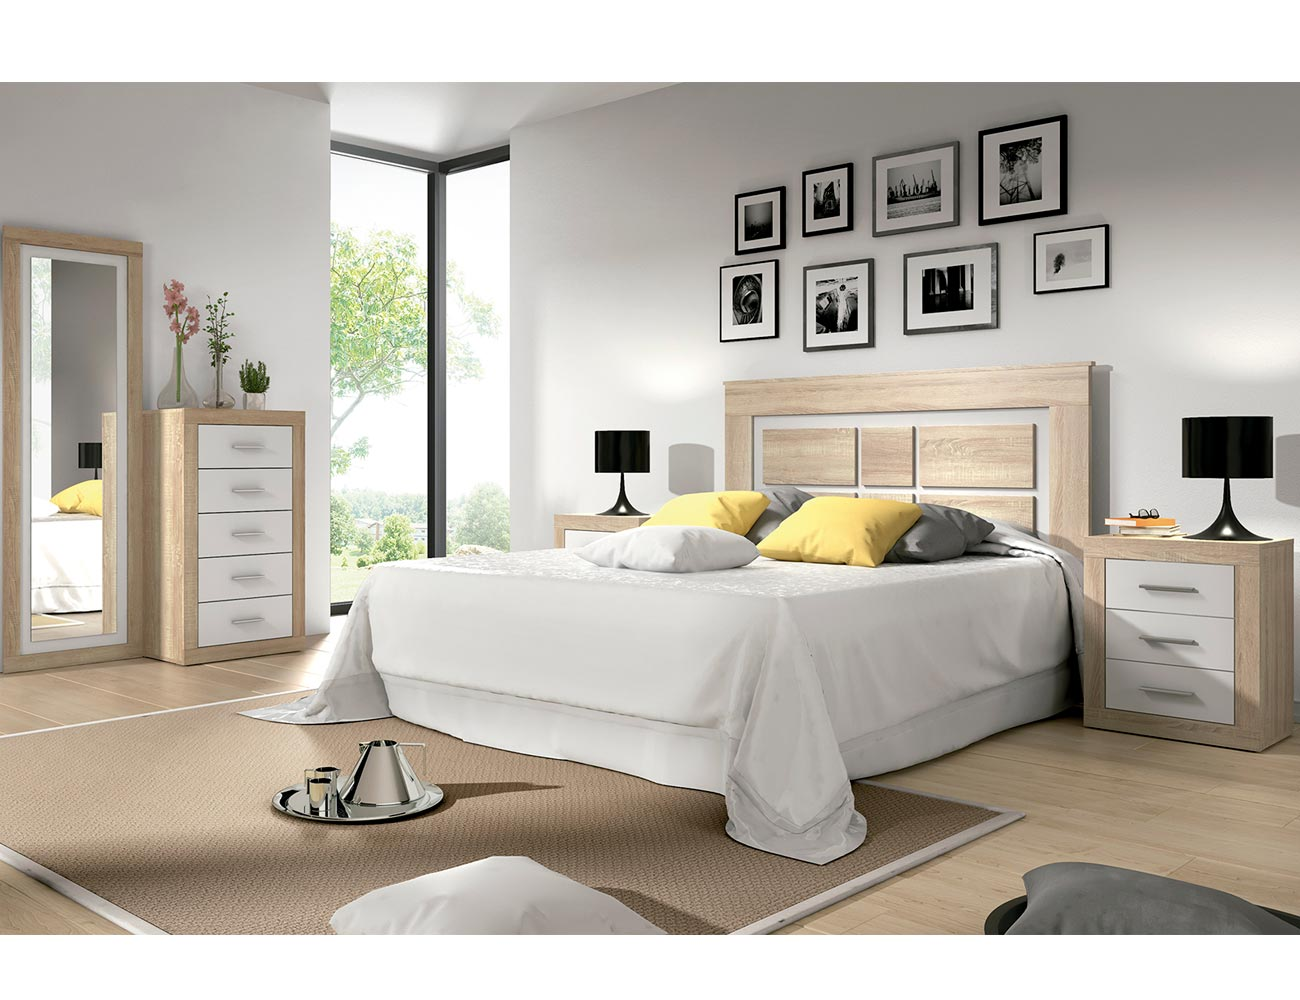 Dormitorio matrimonio estilo moderno cambrian blanco 2134 for Comoda matrimonio